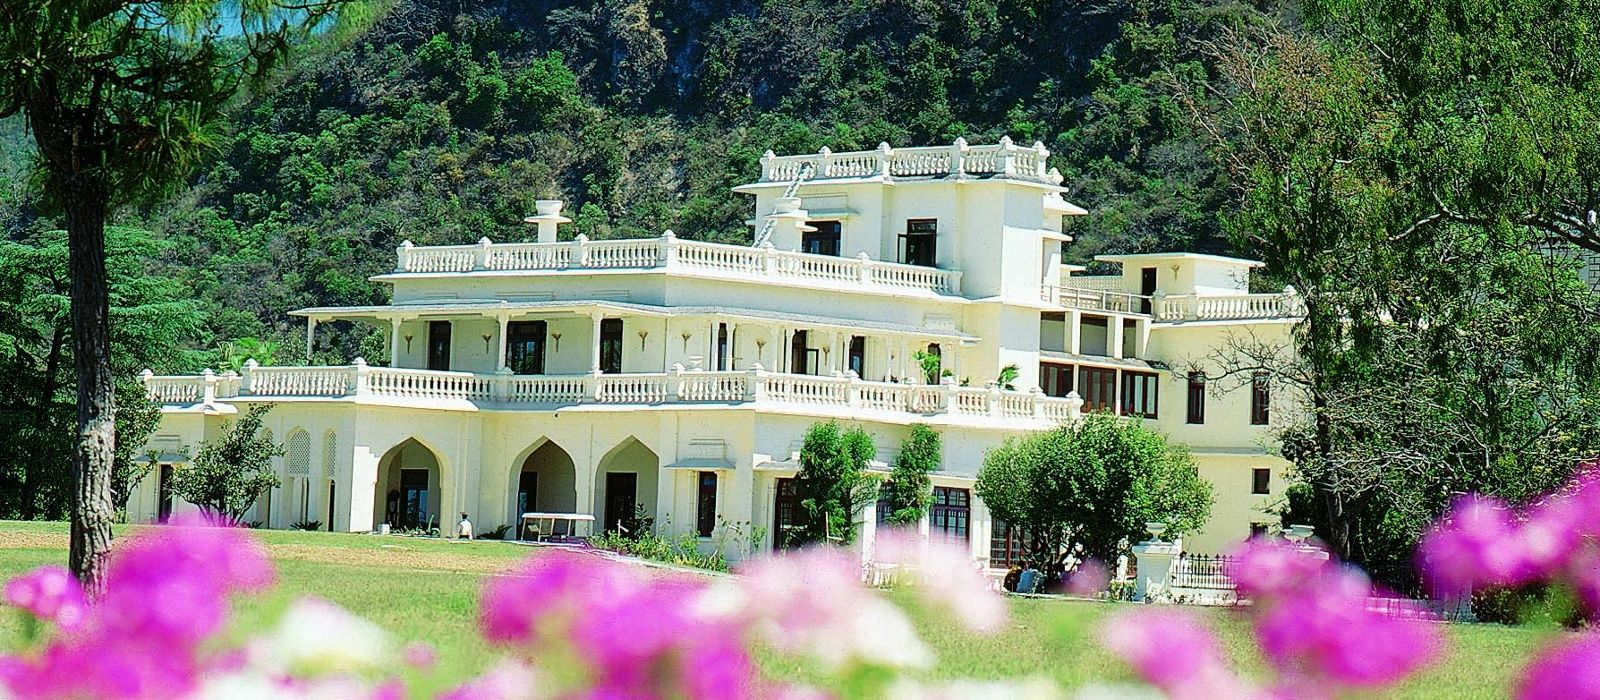 Hotel Ananda in the Himalayas Himalayas